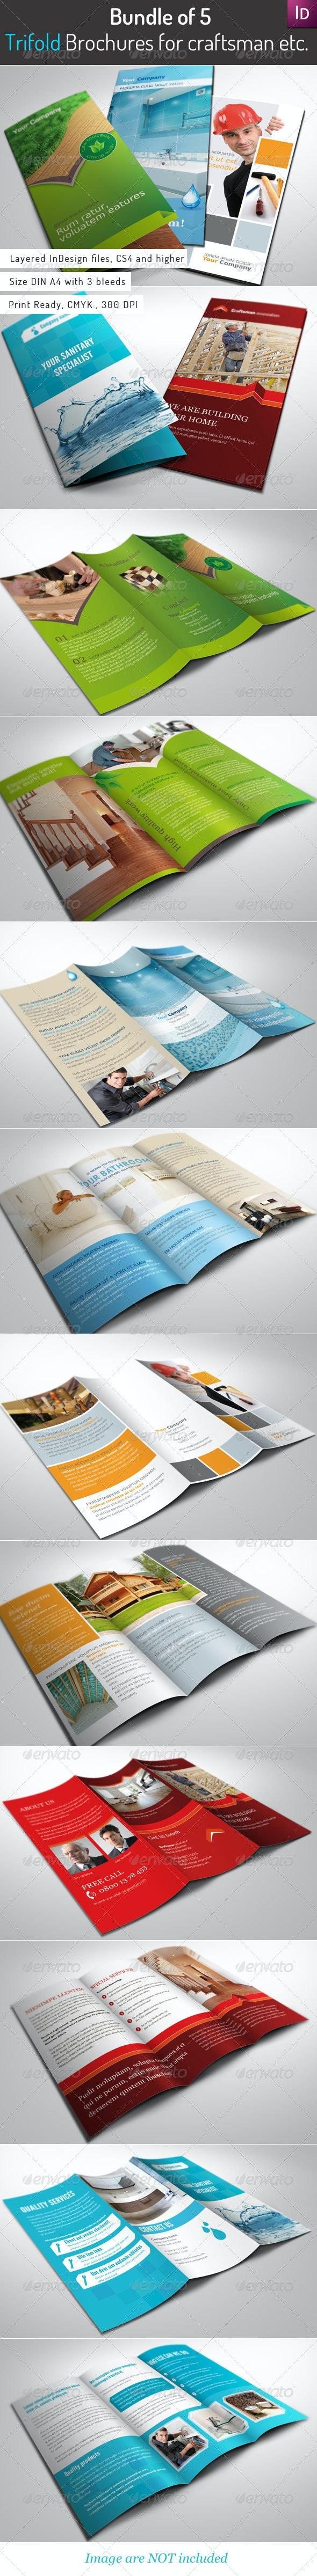 Bundle of 5 Trifold Brochures - Corporate Brochures